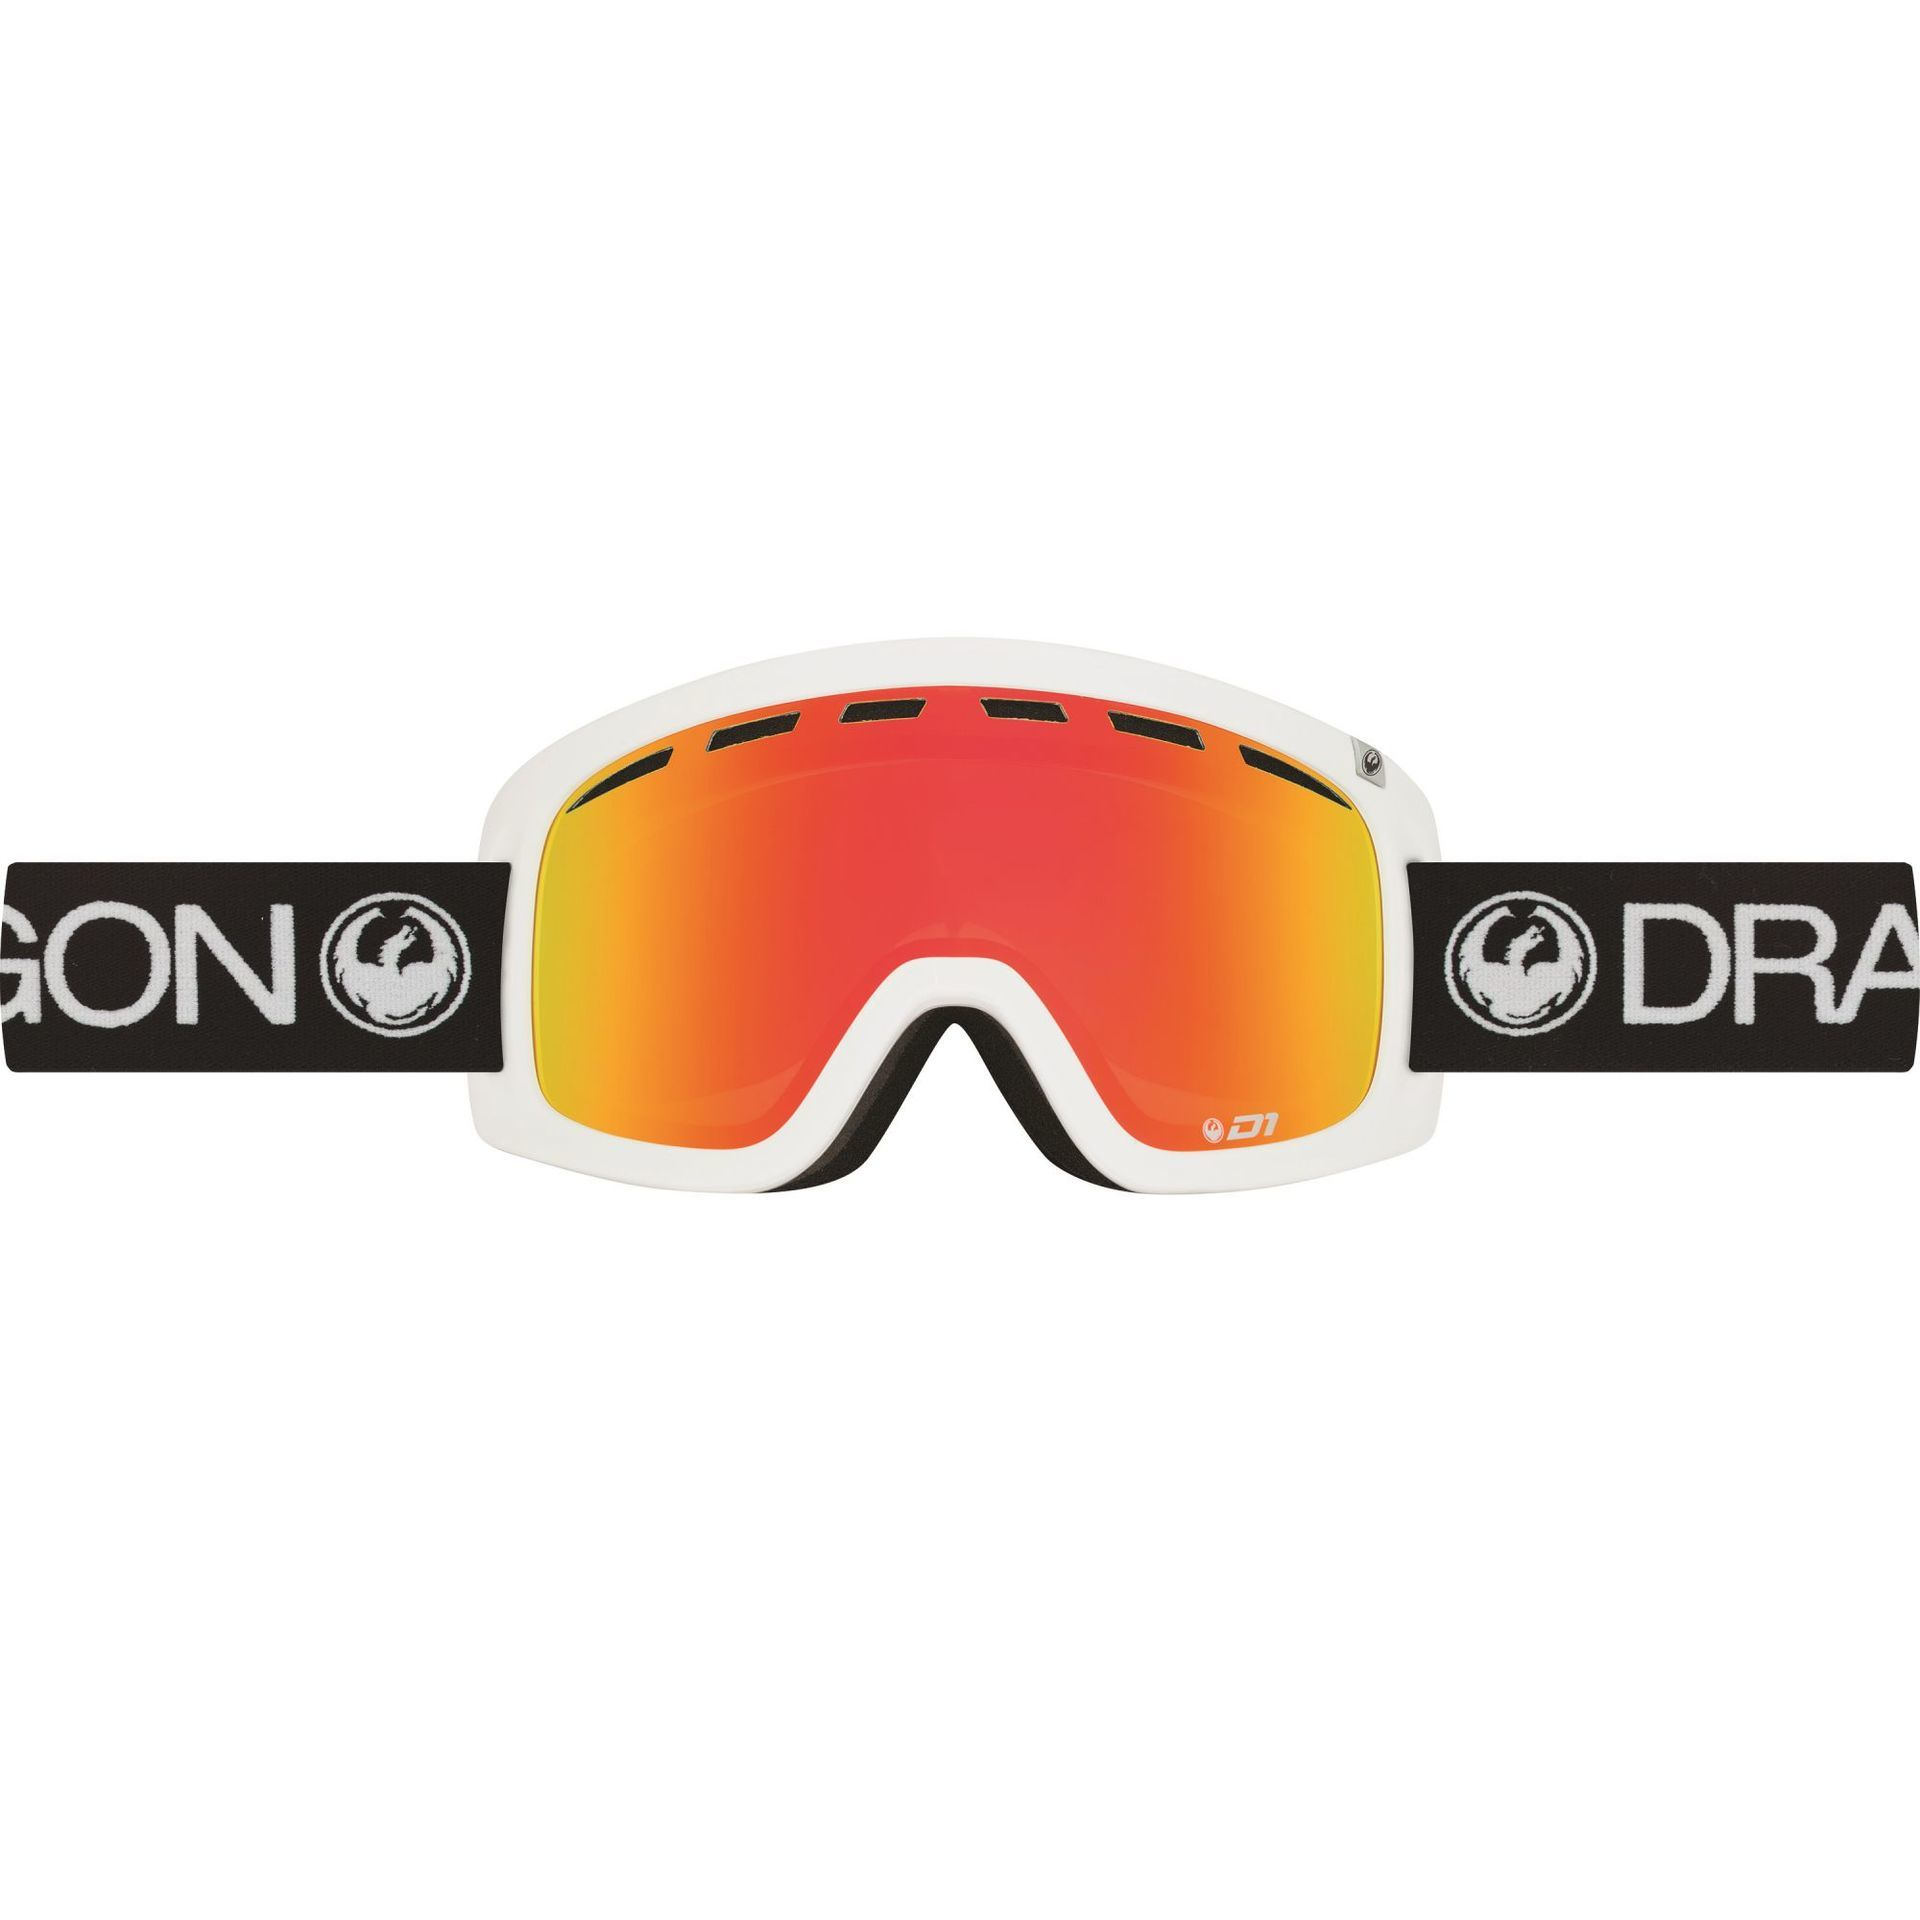 GOGLE DRAGON D1 4903 1